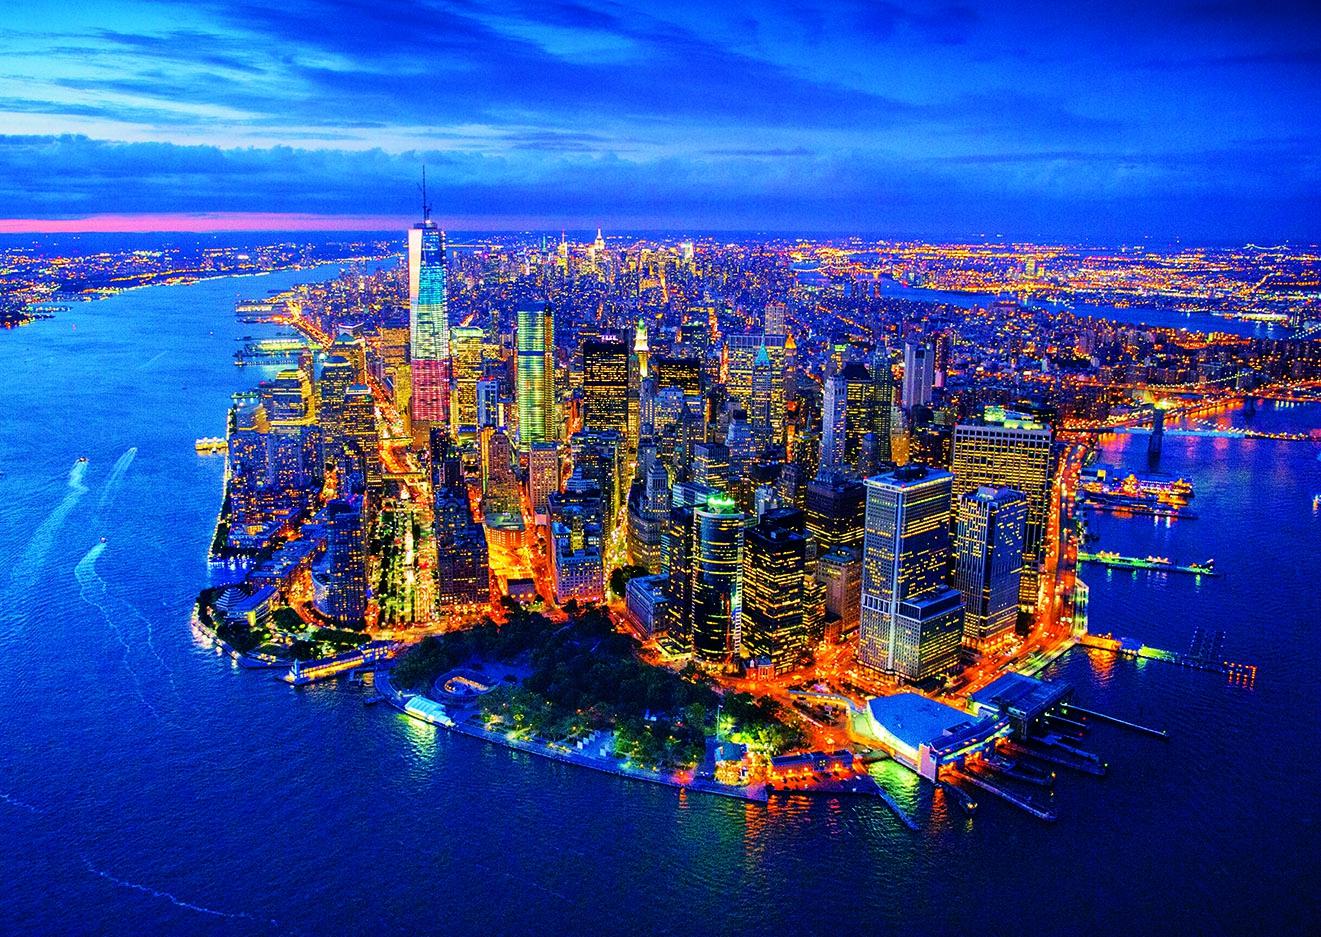 the tourism in new york miami and washington dc